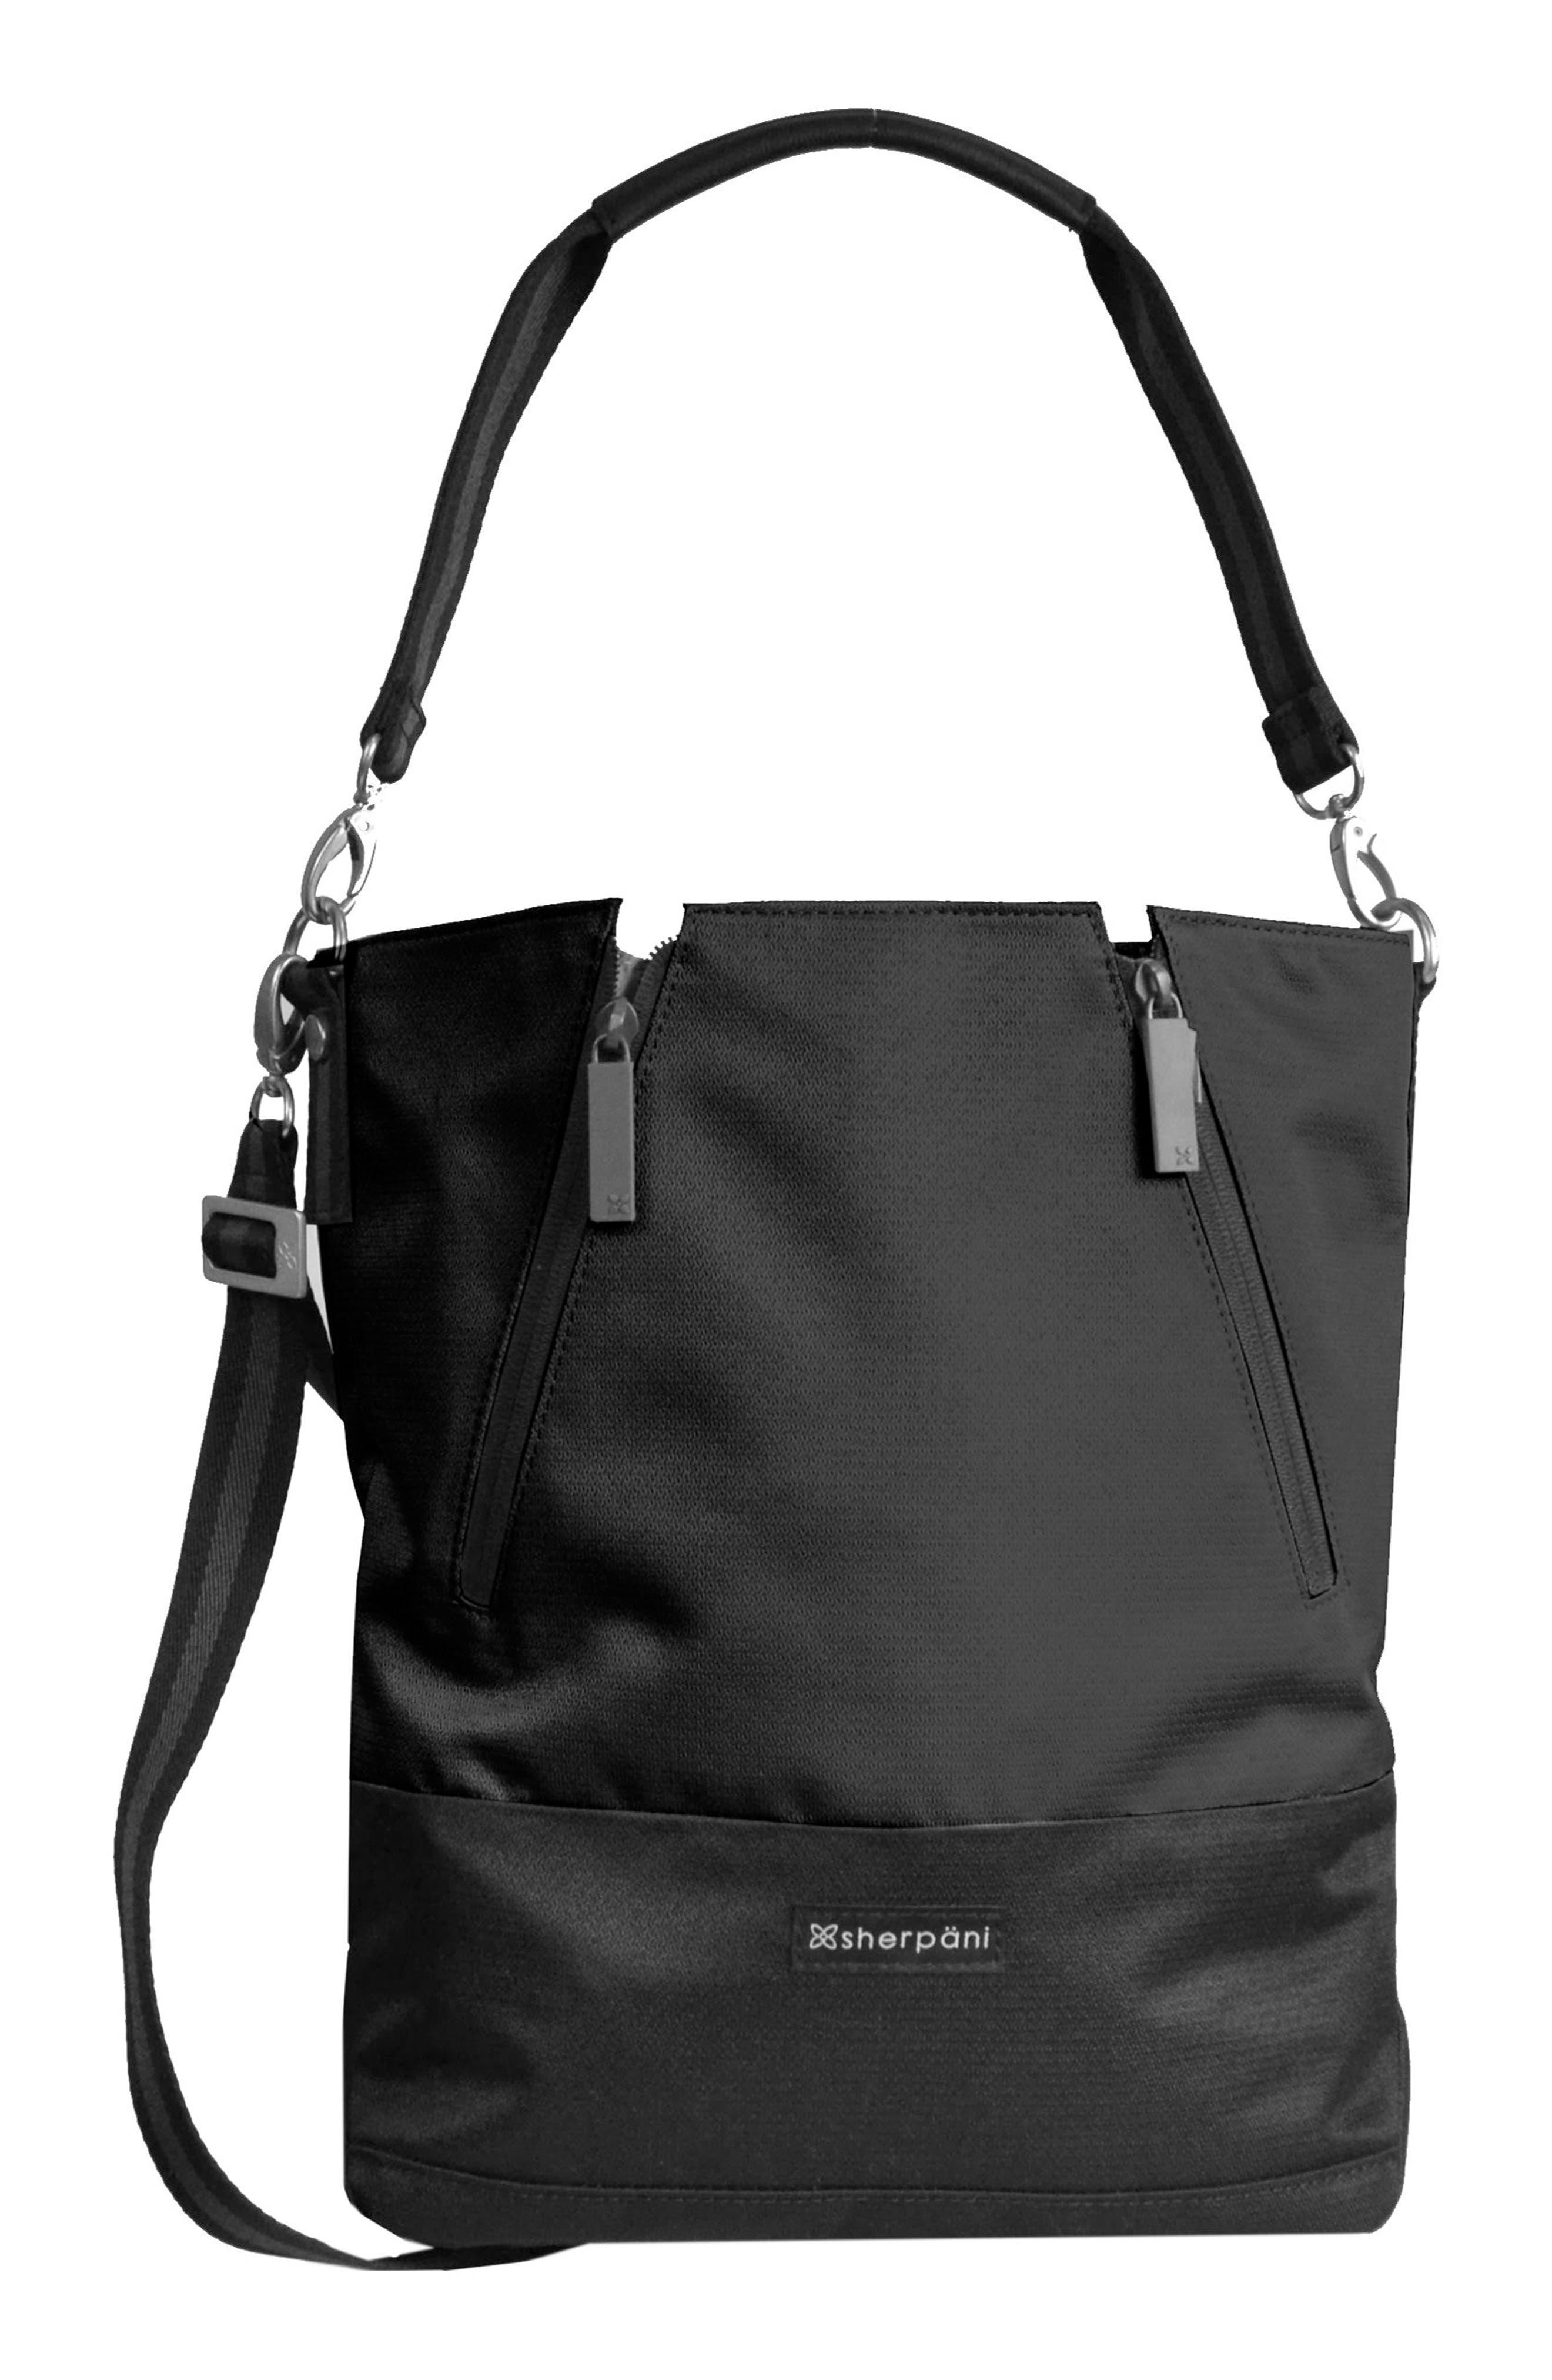 Sherpani Devyn Bucket Bag